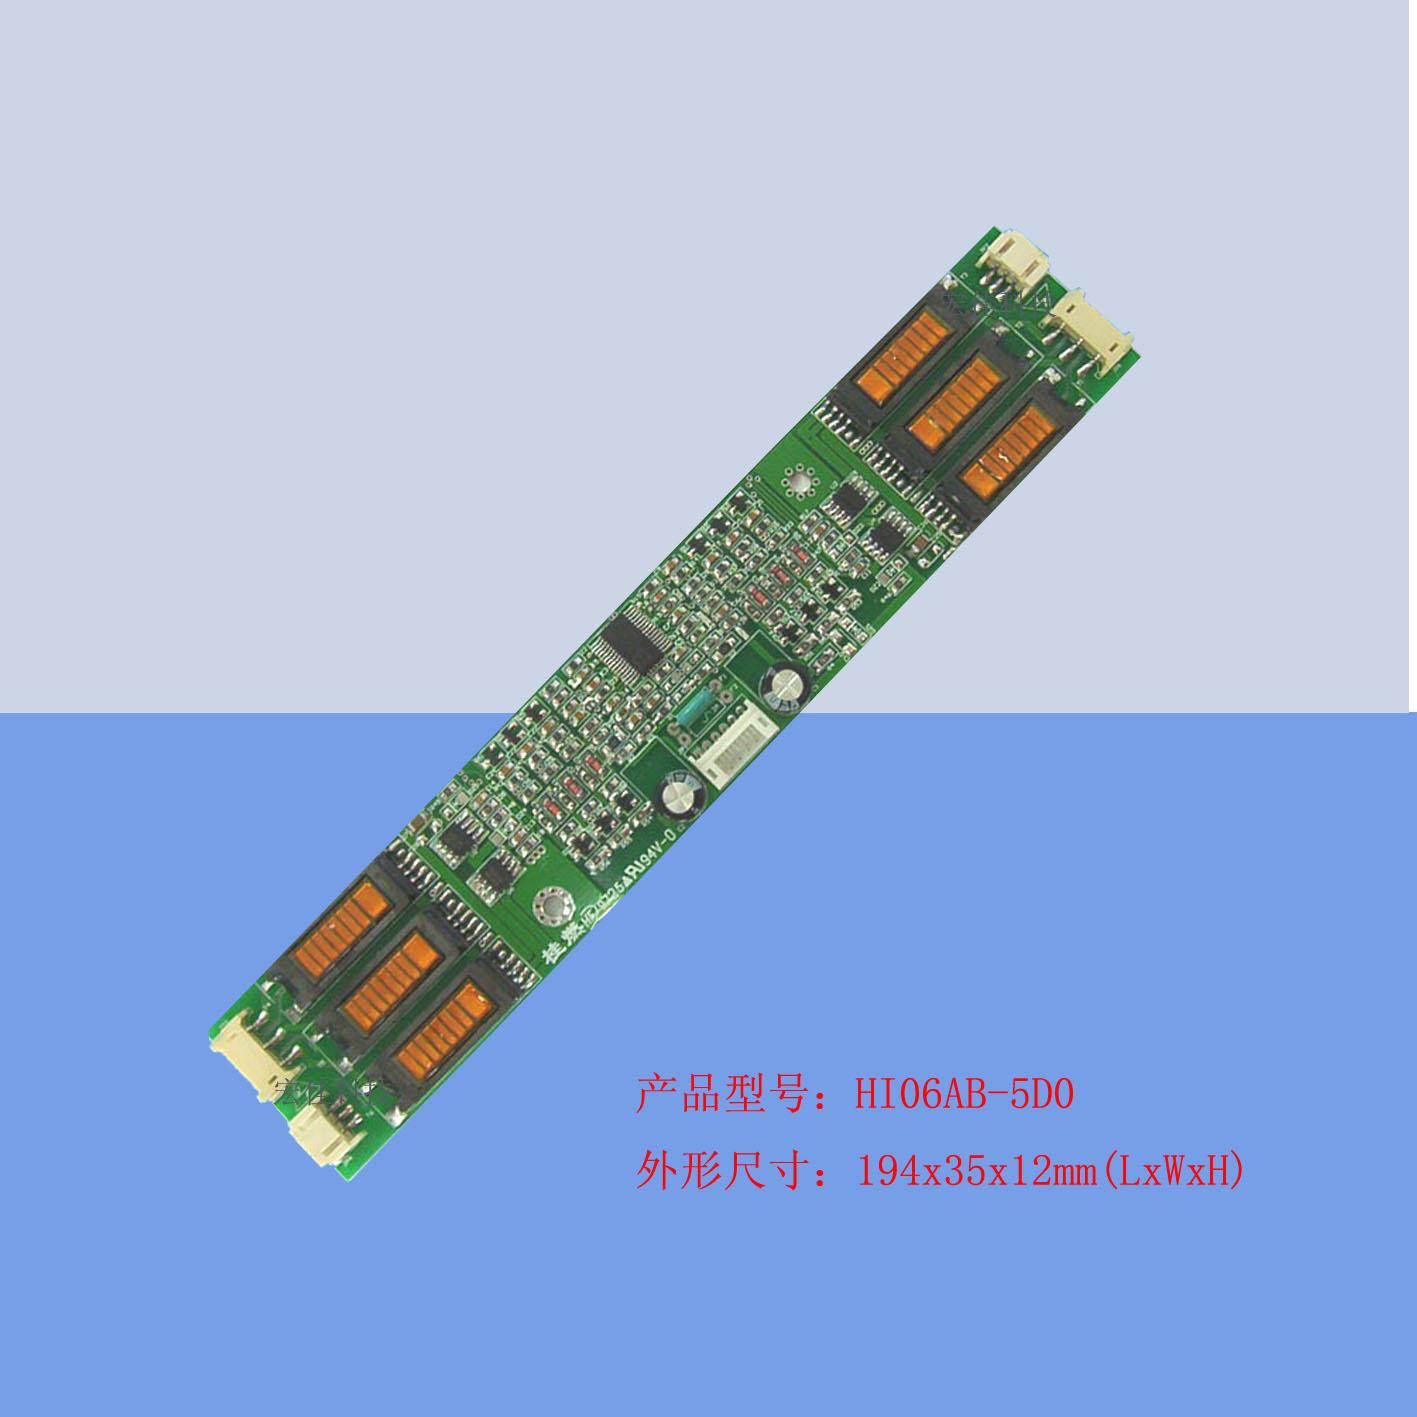 transformer,inverter,power board for LCD tv,lcd monitor etc